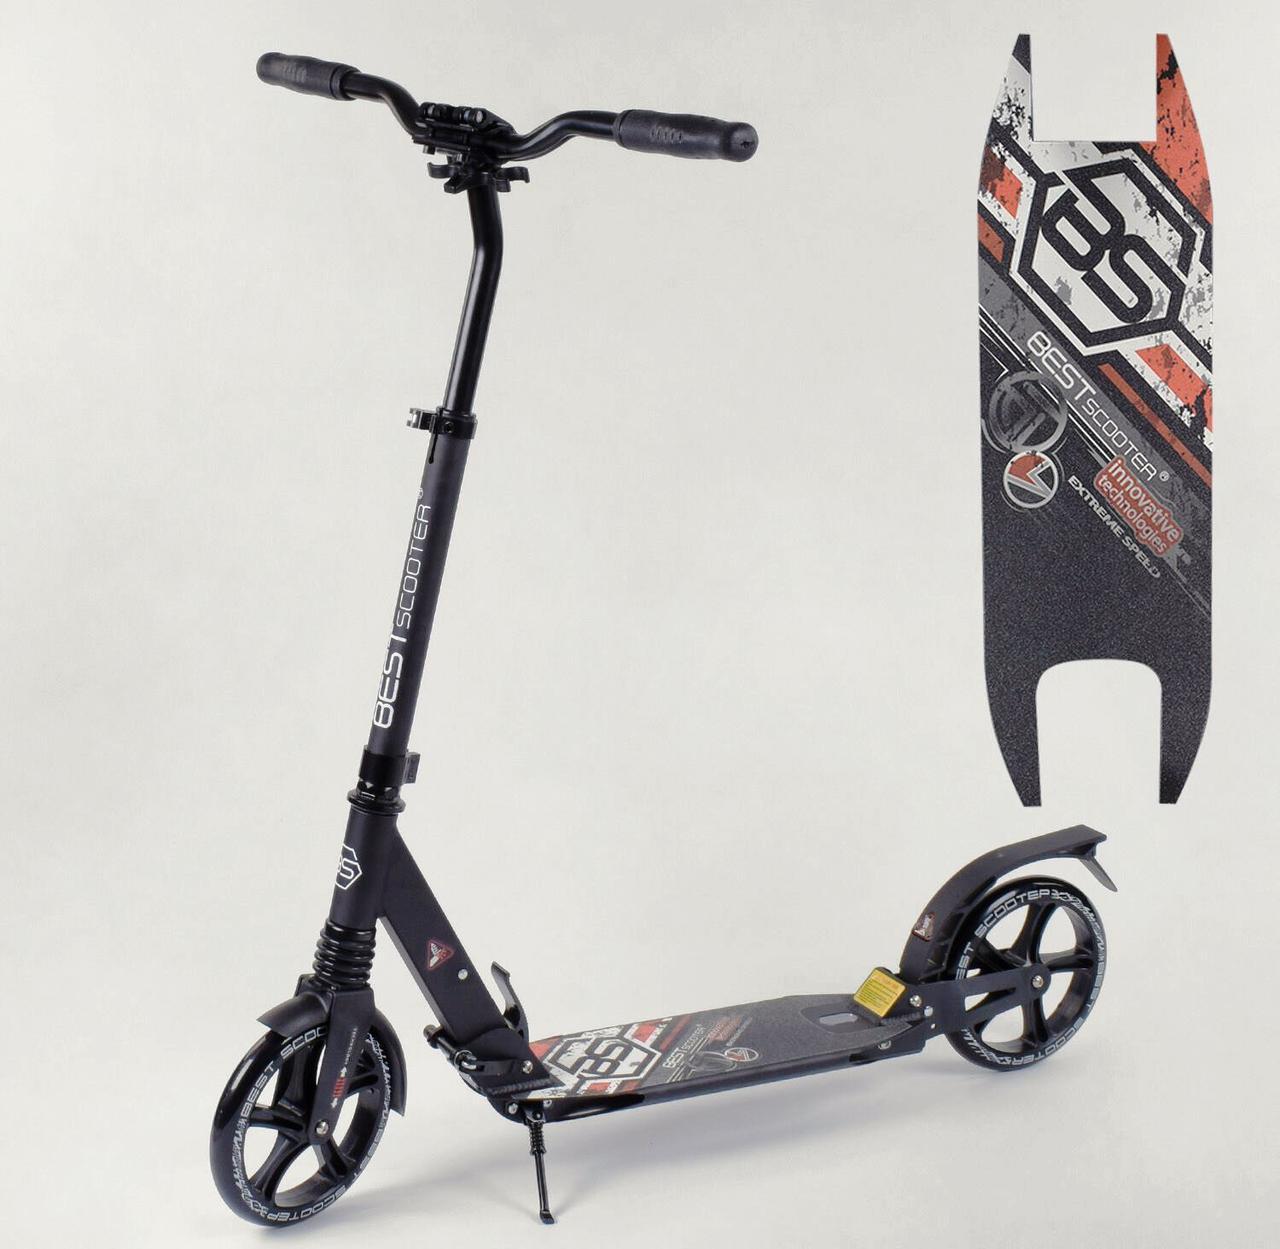 Самокат алюминиевый 54394 Best Scooter, d колес - 20см, колеса PU, 2 аммортизатора